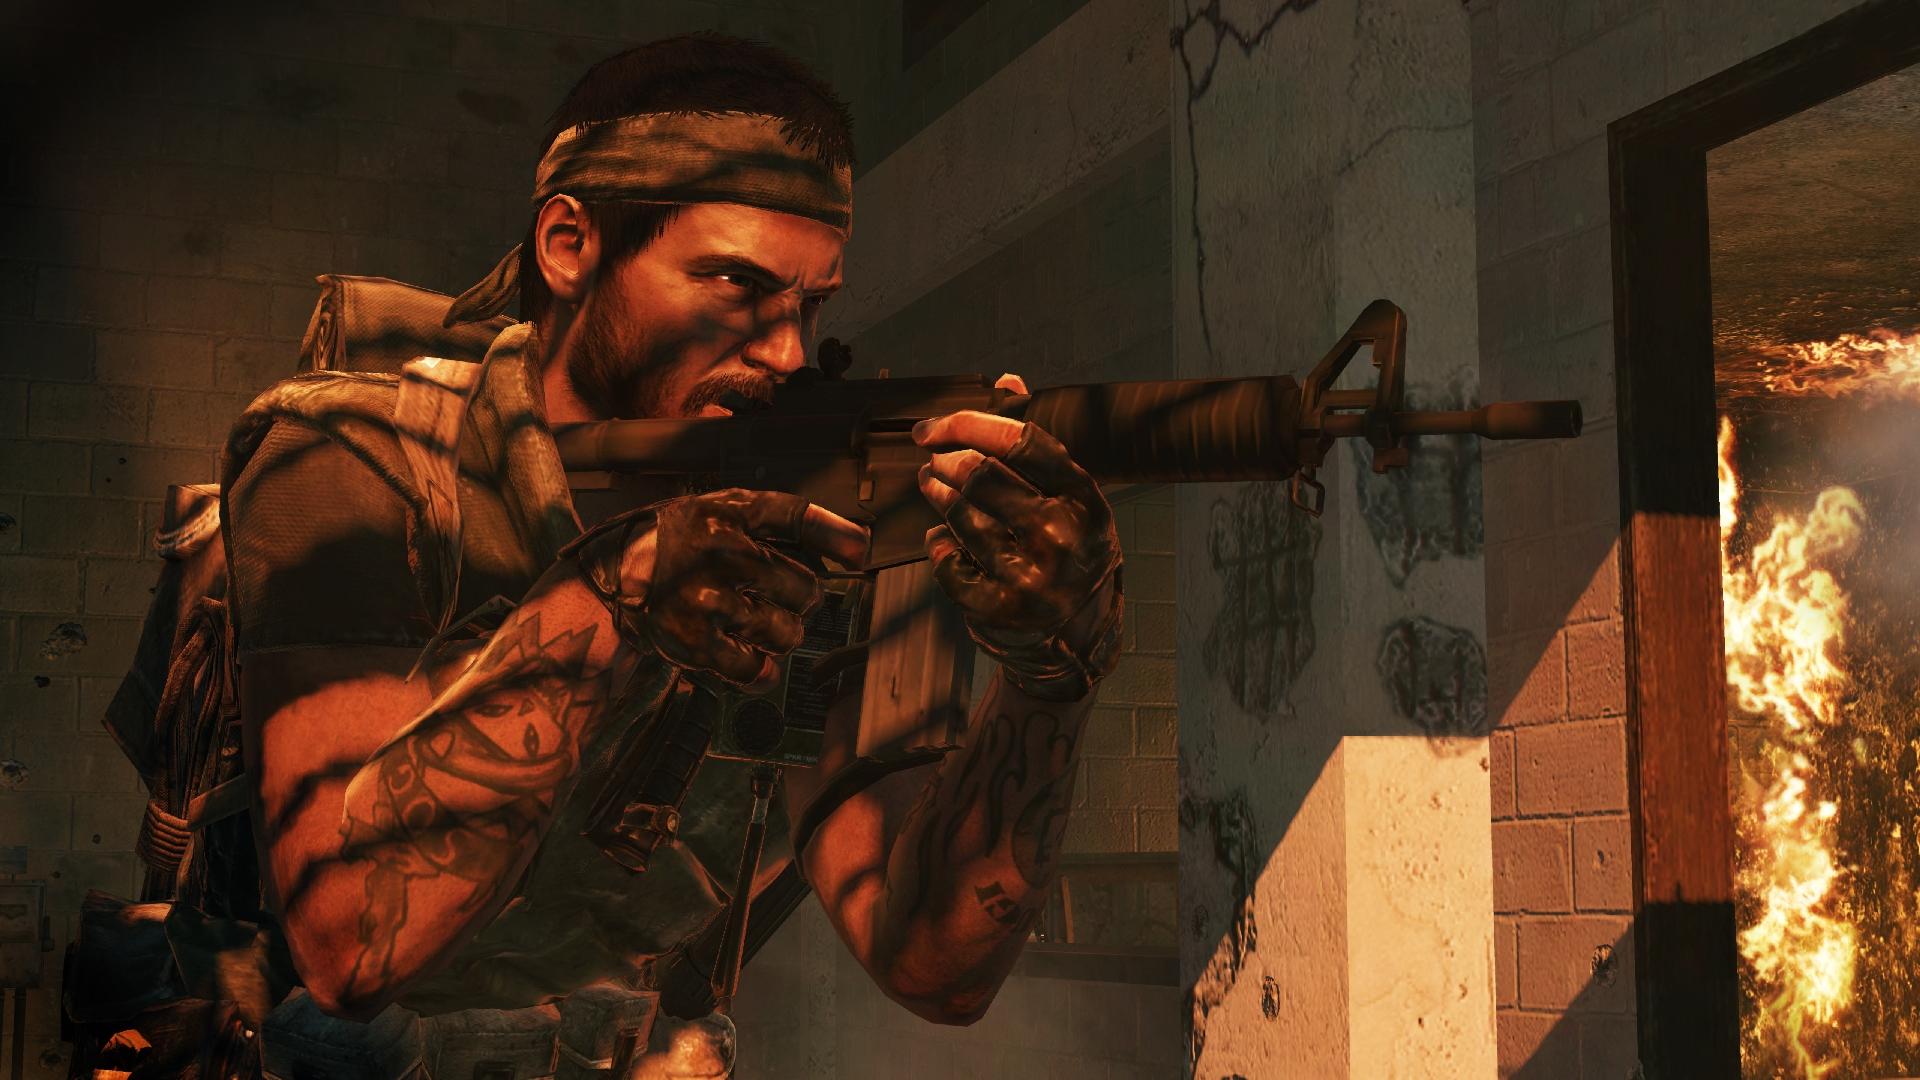 Call of Duty: Black Ops tendrá multiplayer offline… WTF? [GUAT DE FUC?]